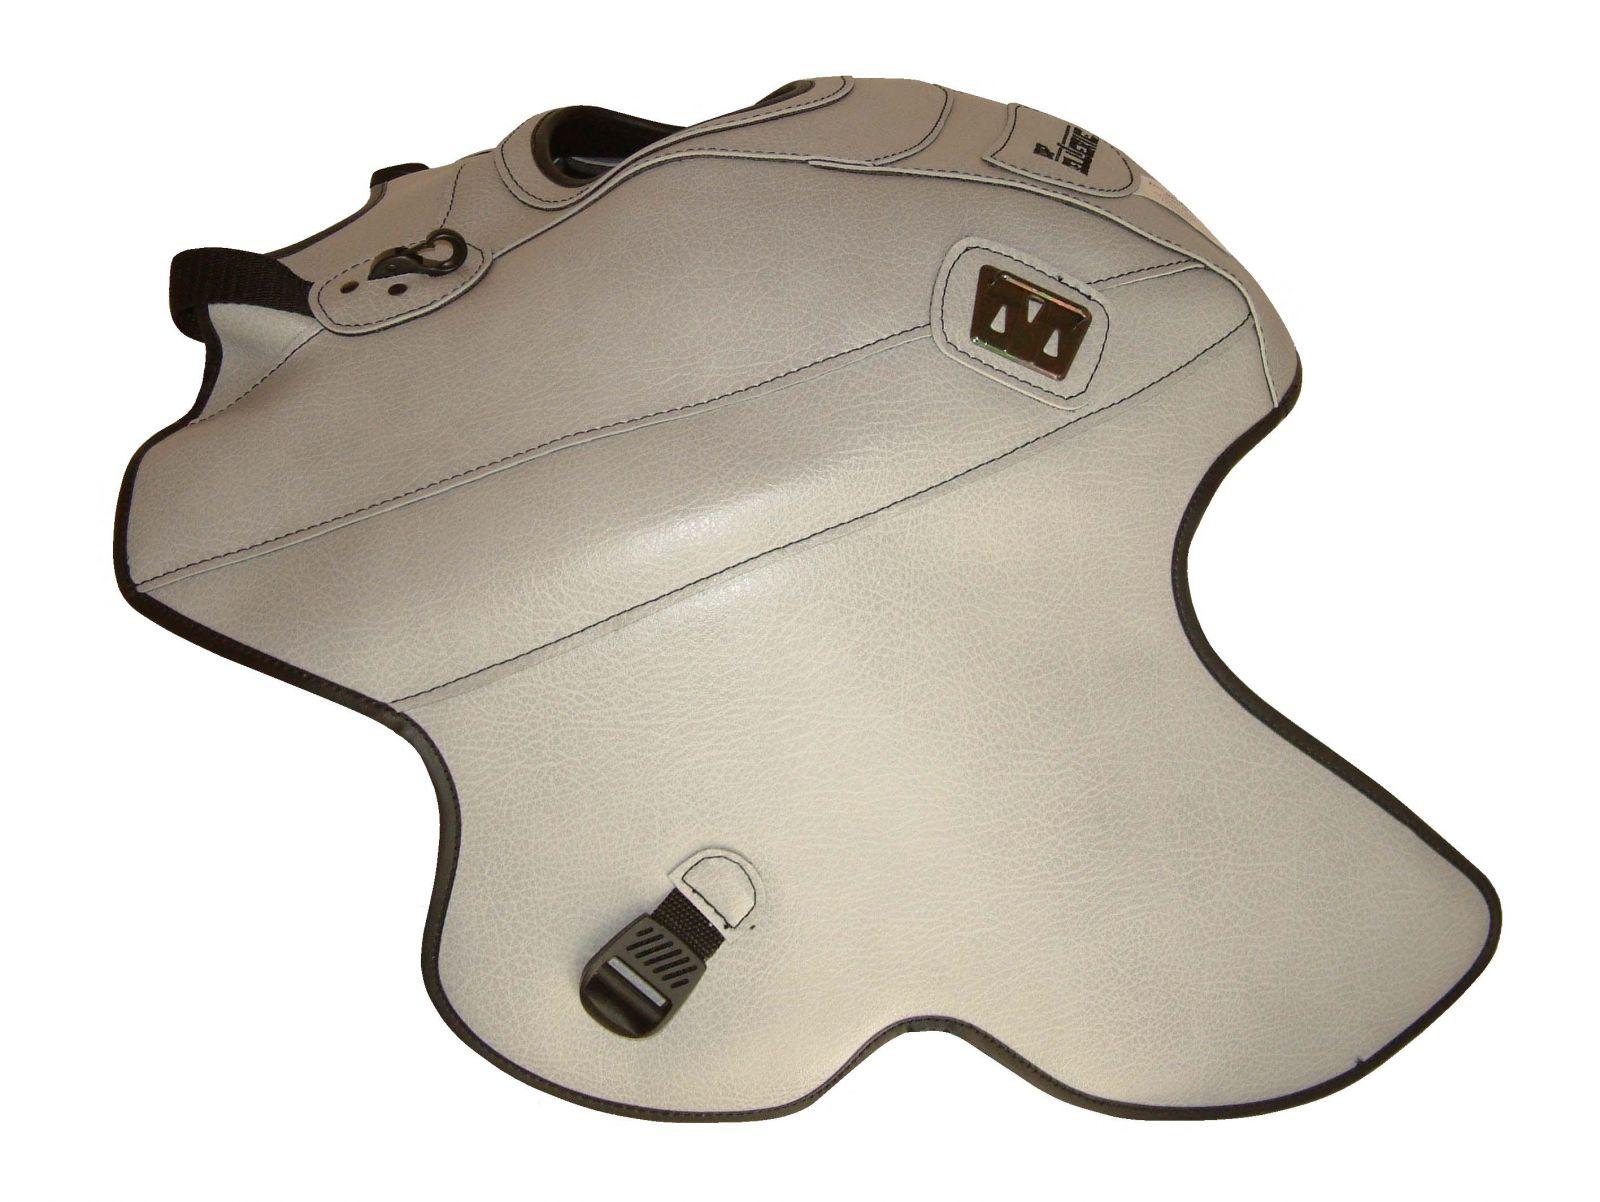 Tapis protège-réservoir TPR4481 - APRILIA PEGASO IE 650 [2001-2006]